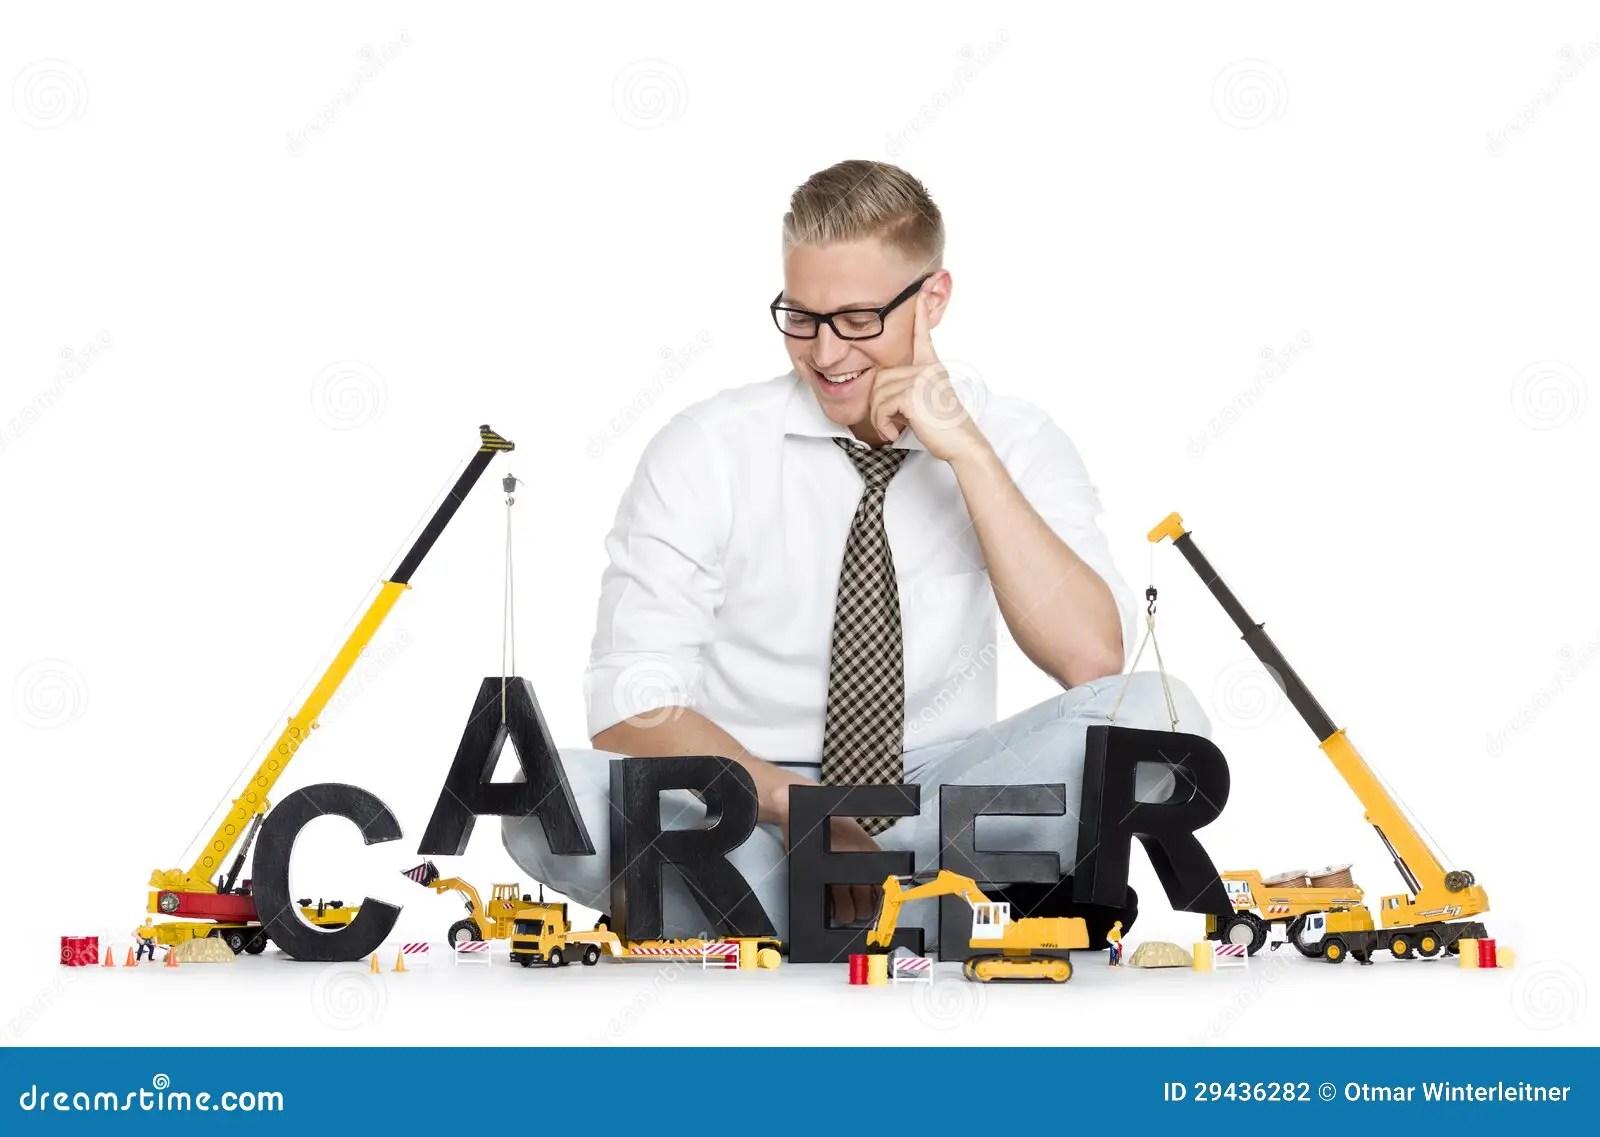 Good Morning Animation Wallpaper Career Start Up Businessman Building Career Word Stock